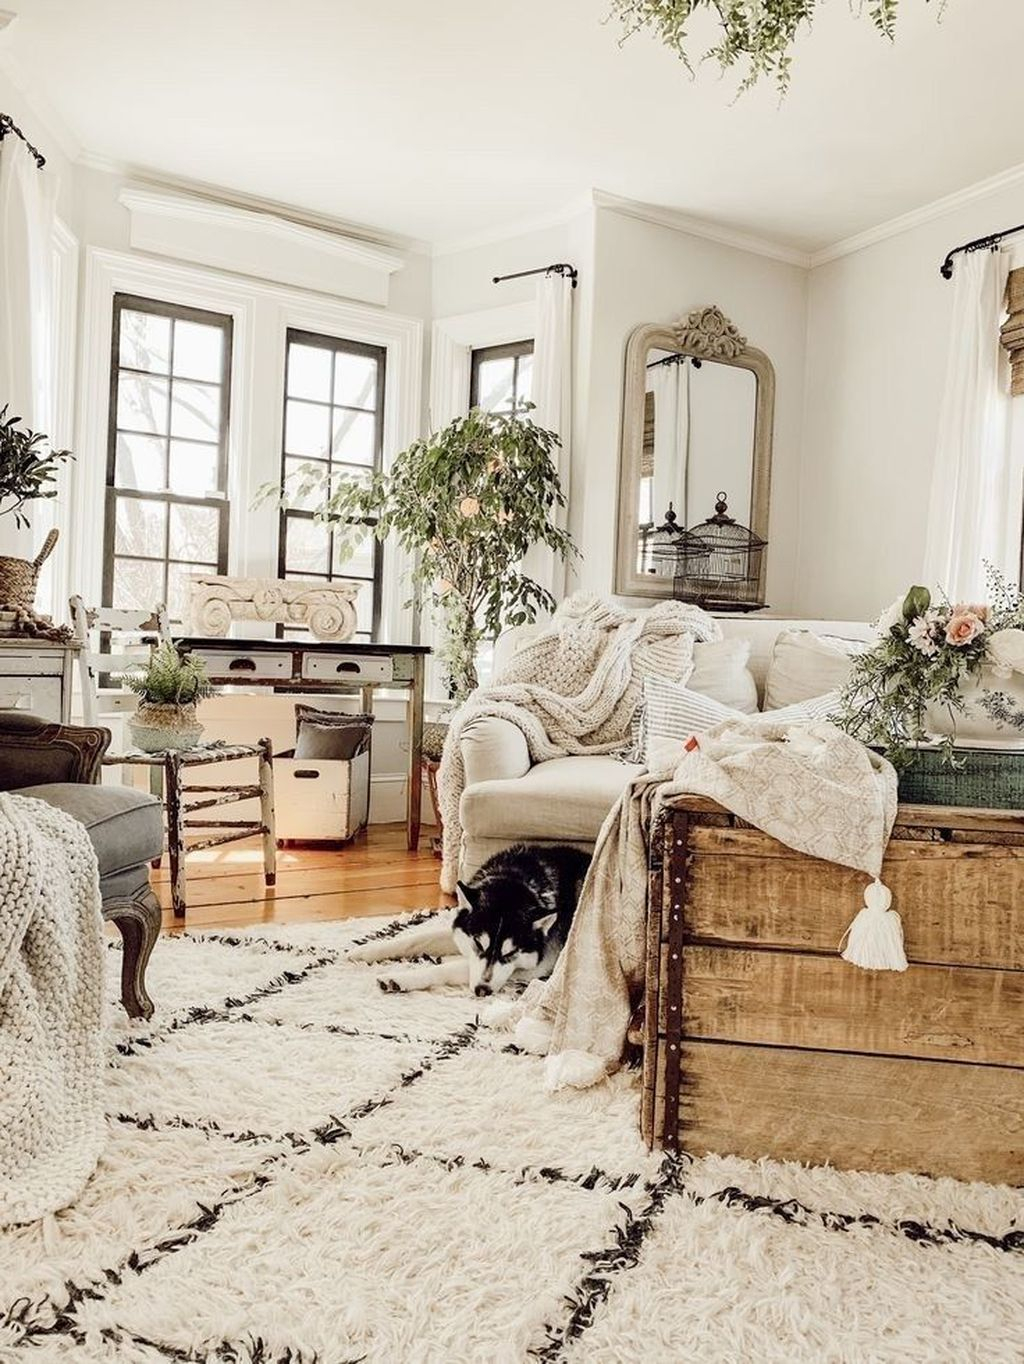 Rustic Farmhouse Furniture Design Ideas For Living Room 35